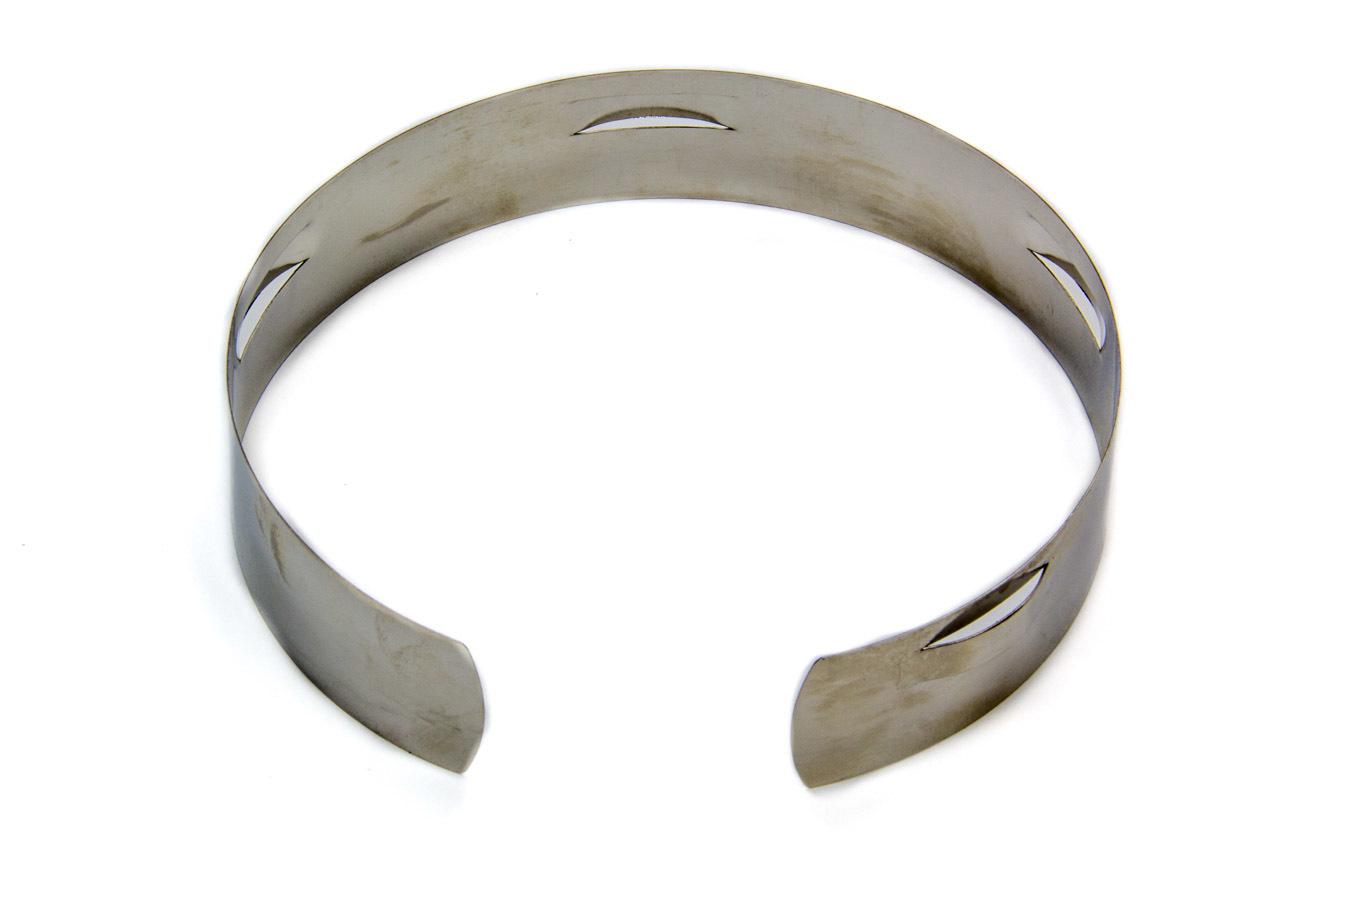 Proform 67652 Piston Ring Squaring Tool, Steel, Zinc Oxide, Universal, Each